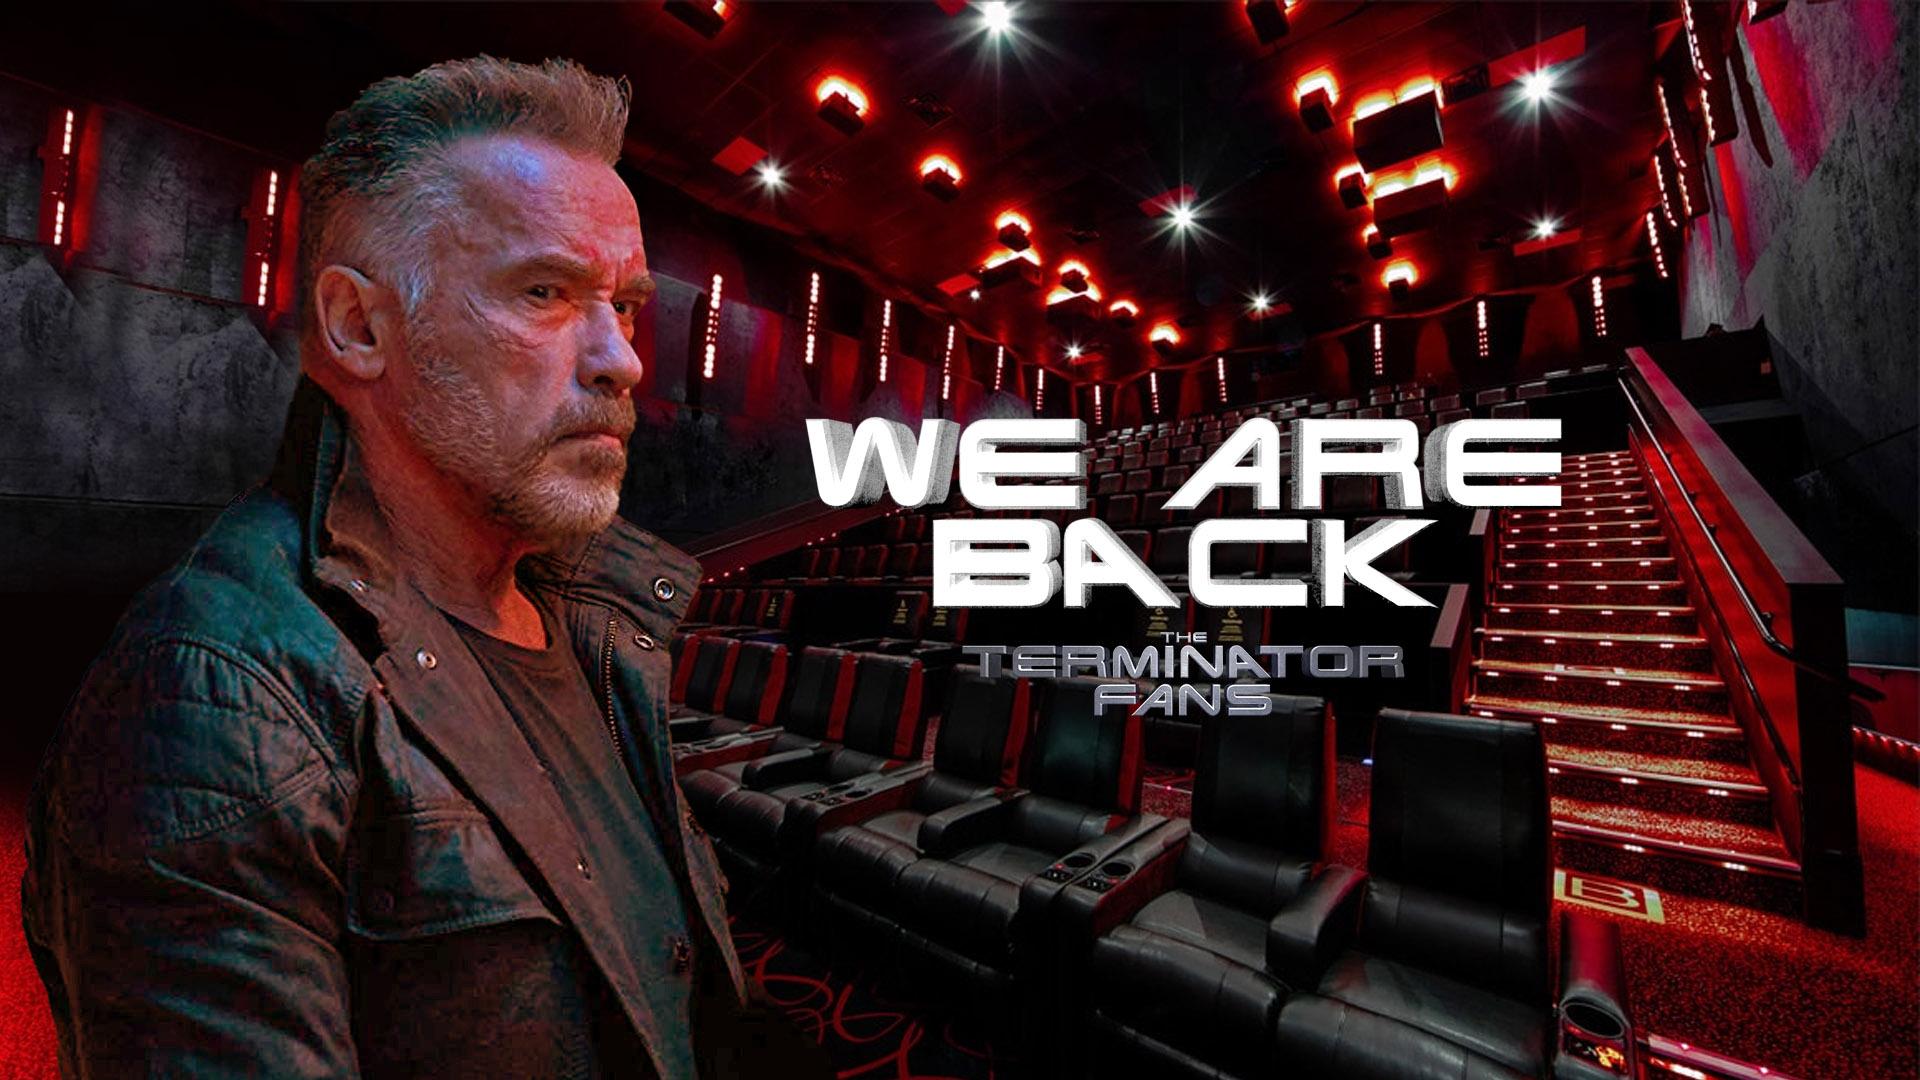 Arnold Schwarzenegger The Big Screen Is Back